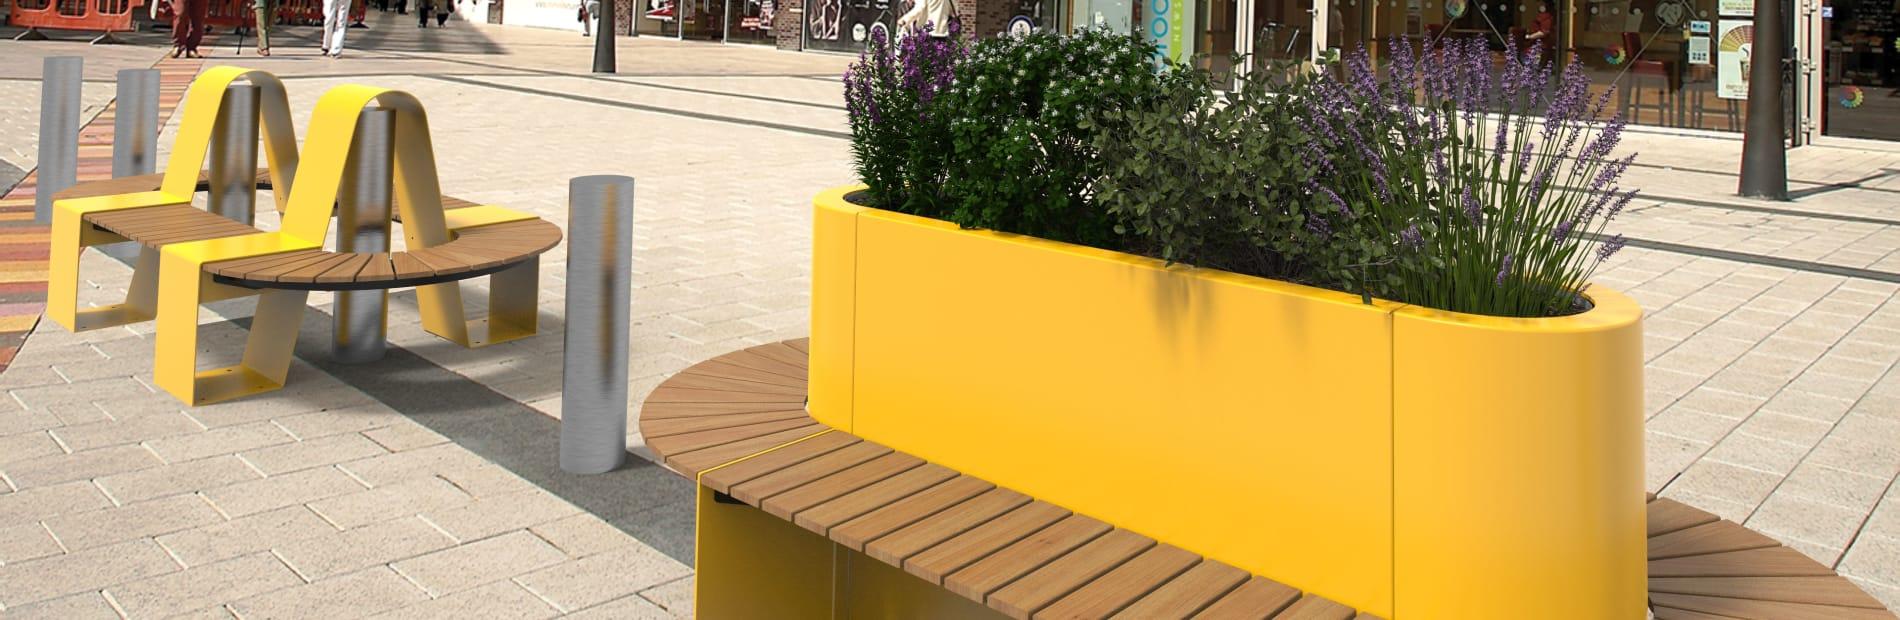 Kirkos HVM street furniture